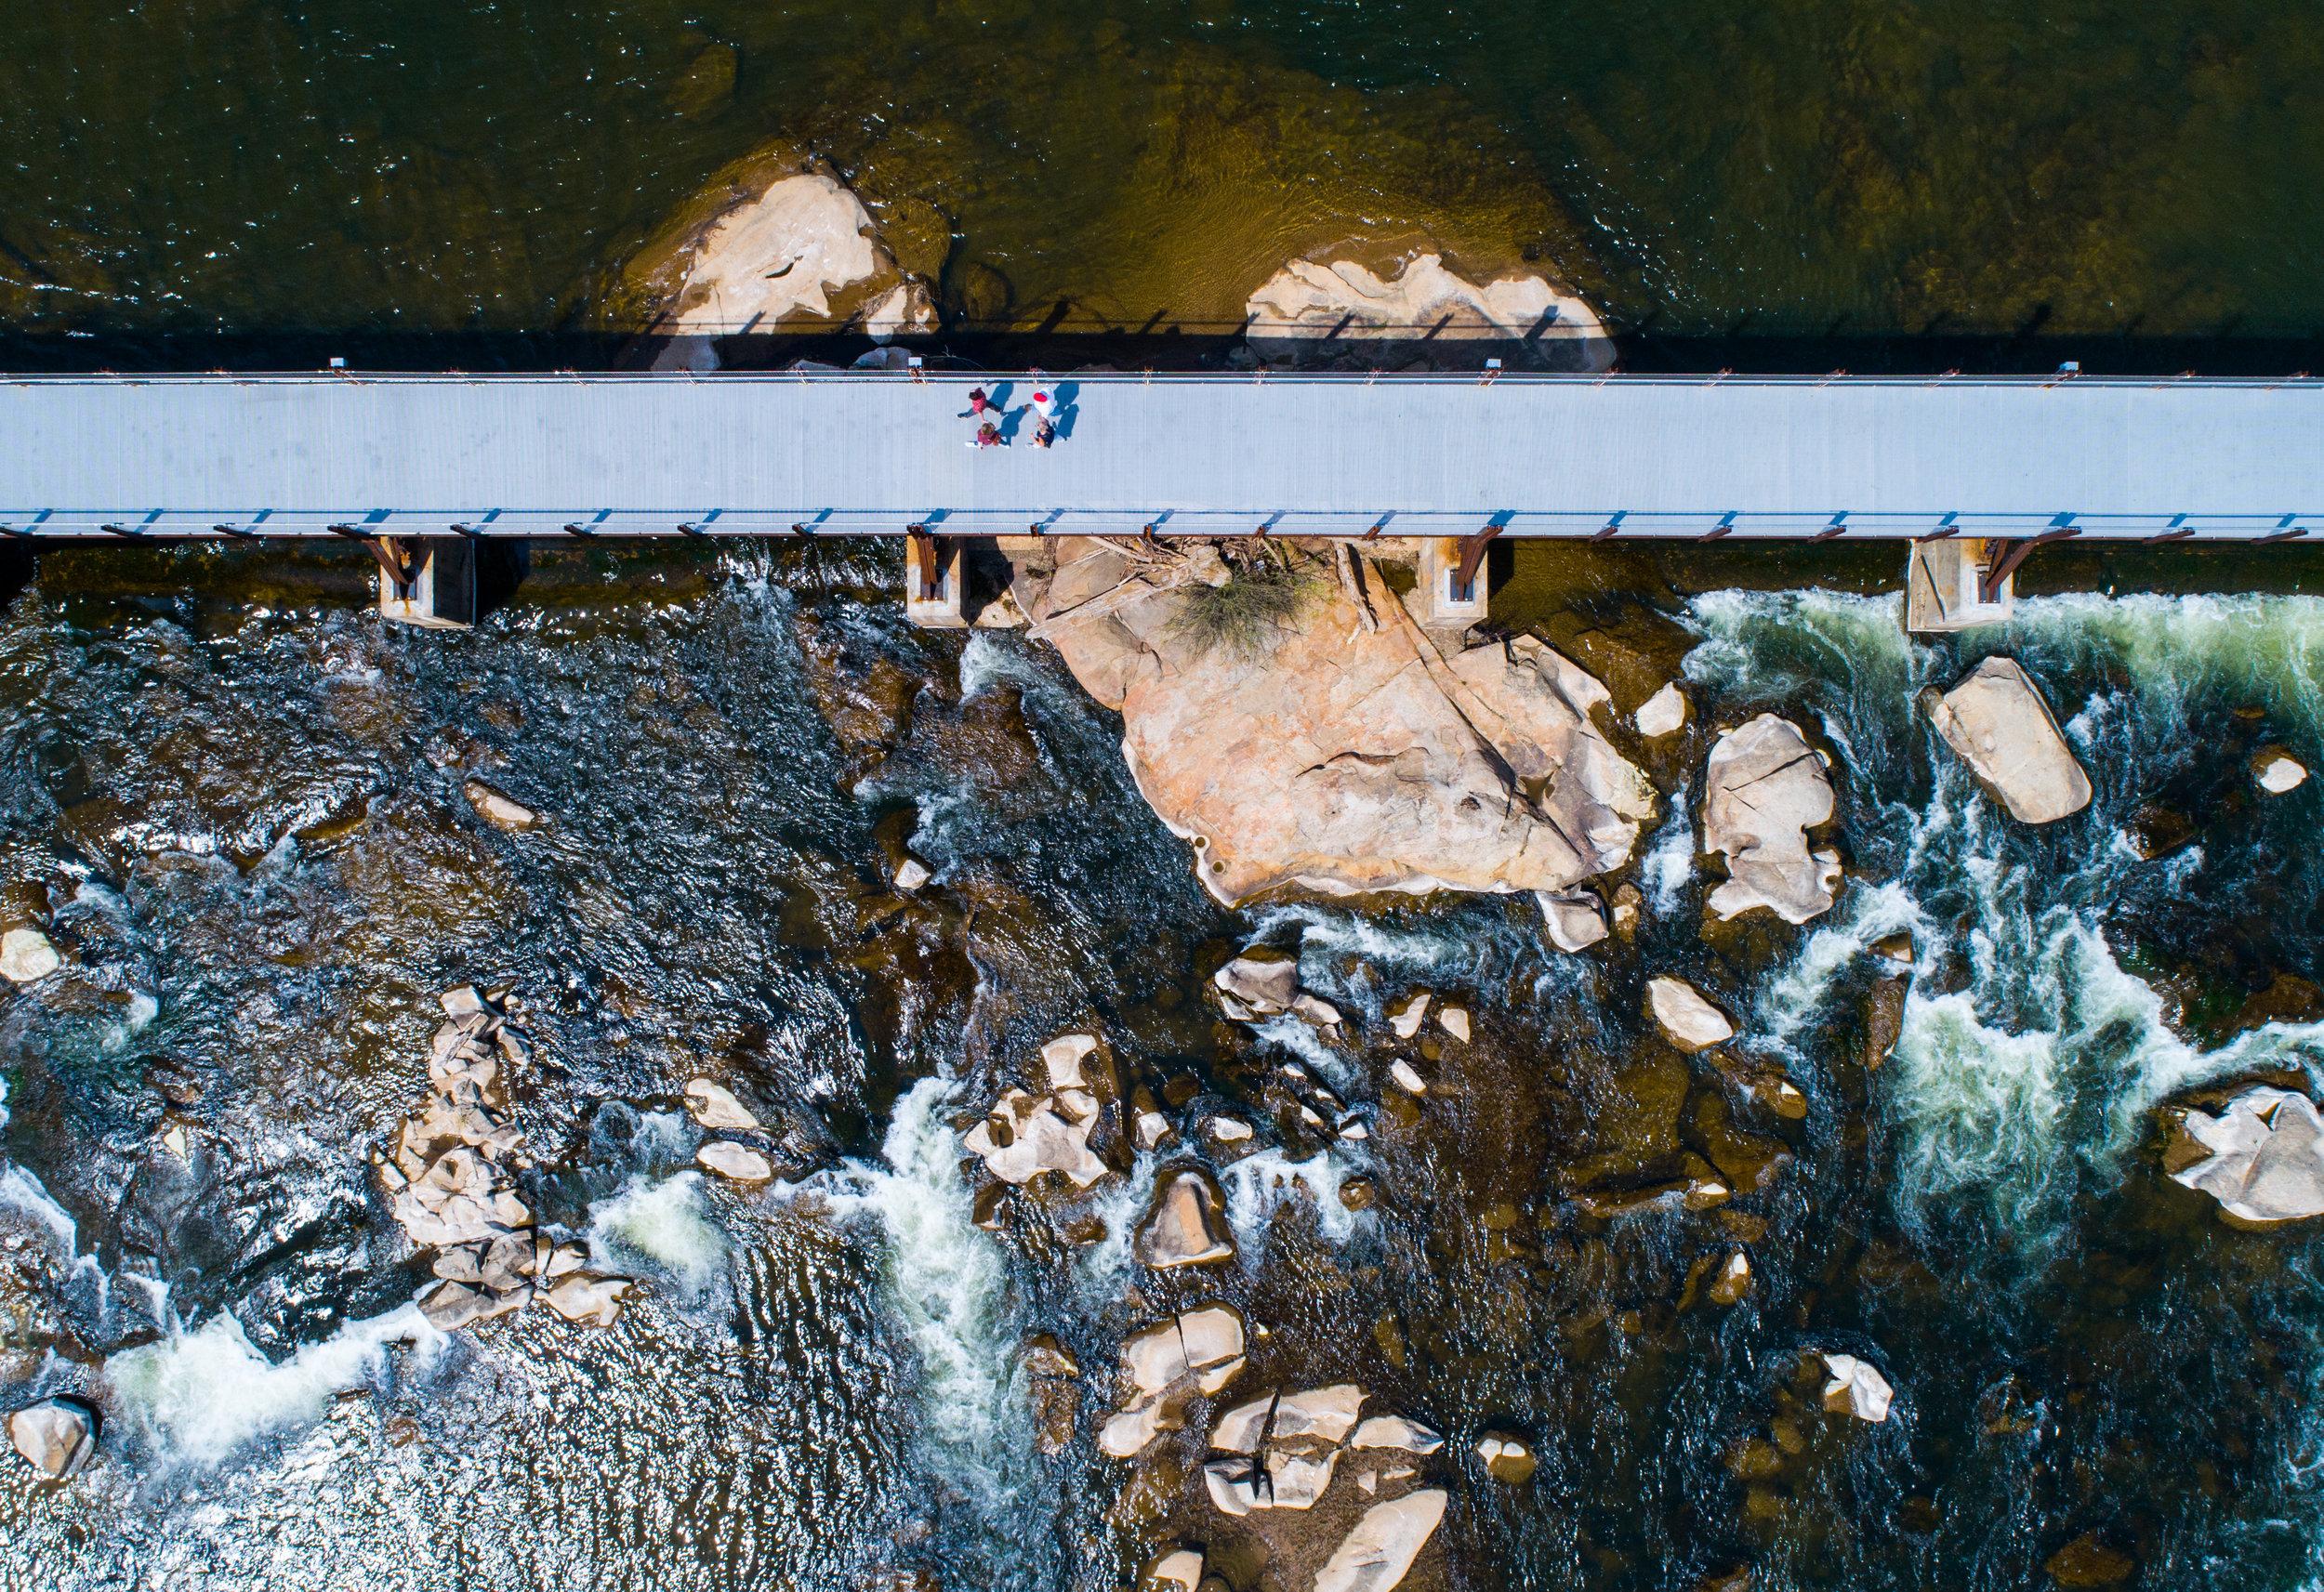 River_front-6.jpg